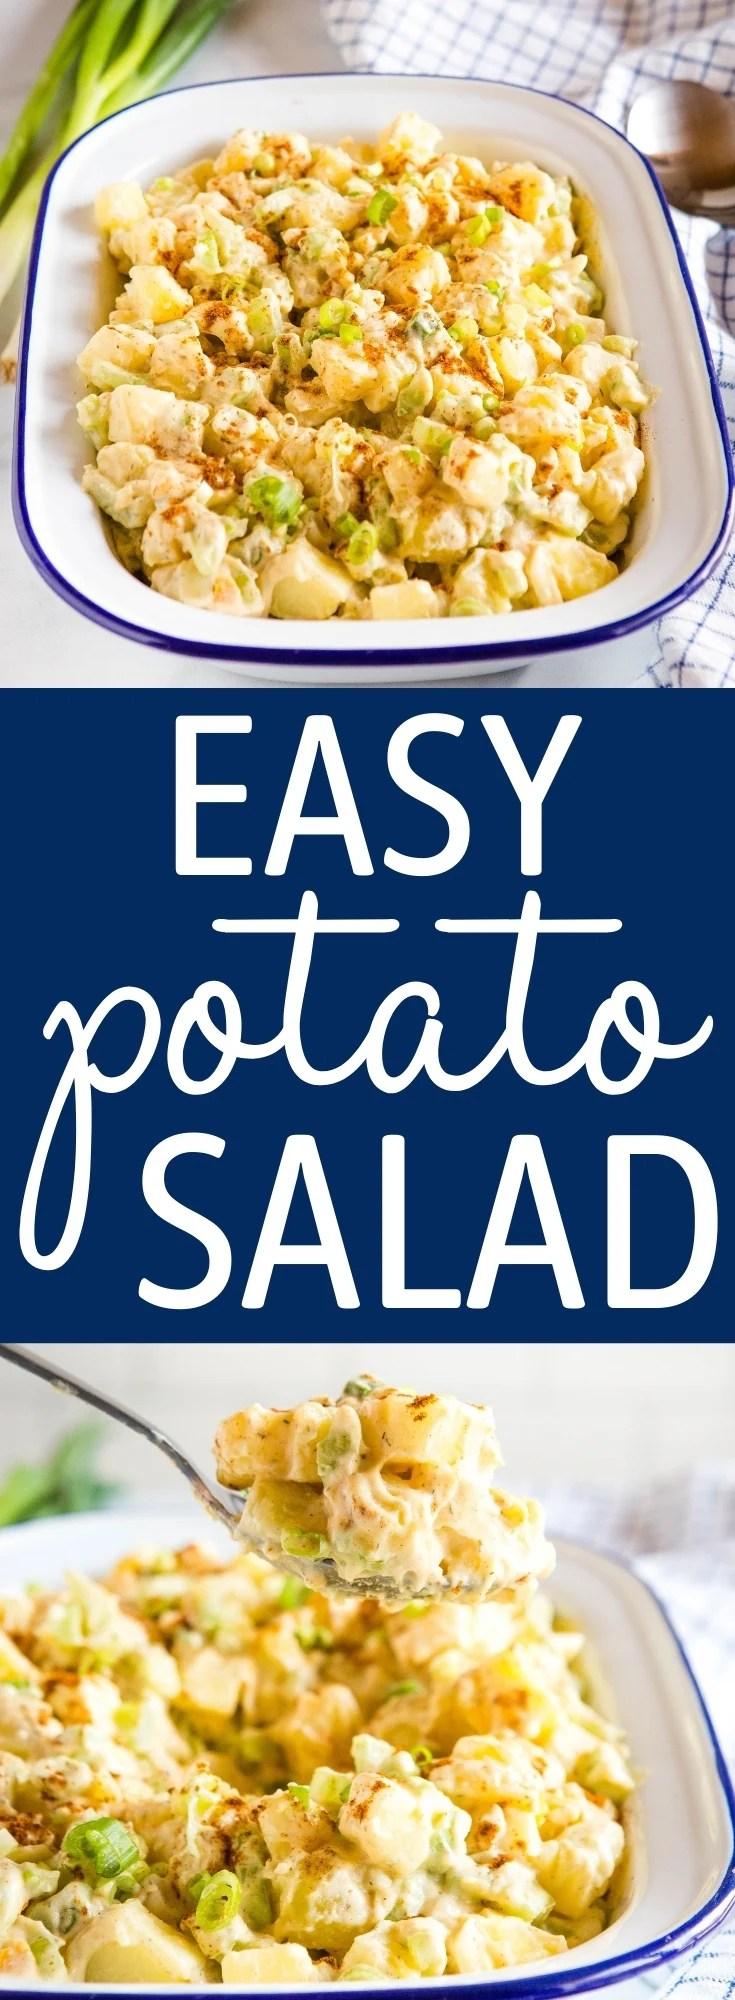 Easy Potato Salad Recipe Pinterest